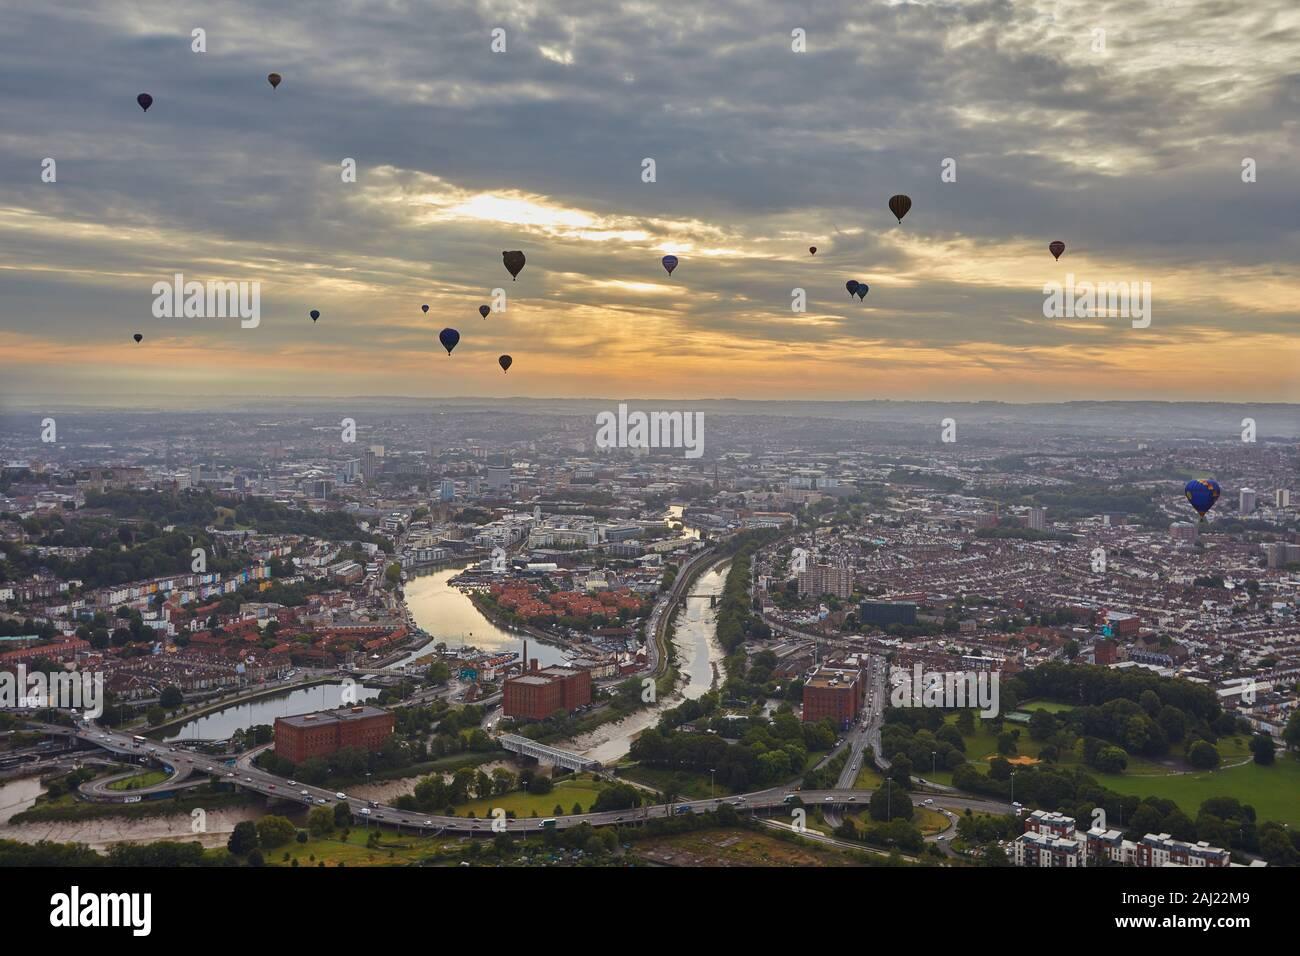 Hot-air balloons flying over the city of Bristol during the Bristol International Balloon Fiesta, Bristol, England, United Kingdom, Europe Stock Photo